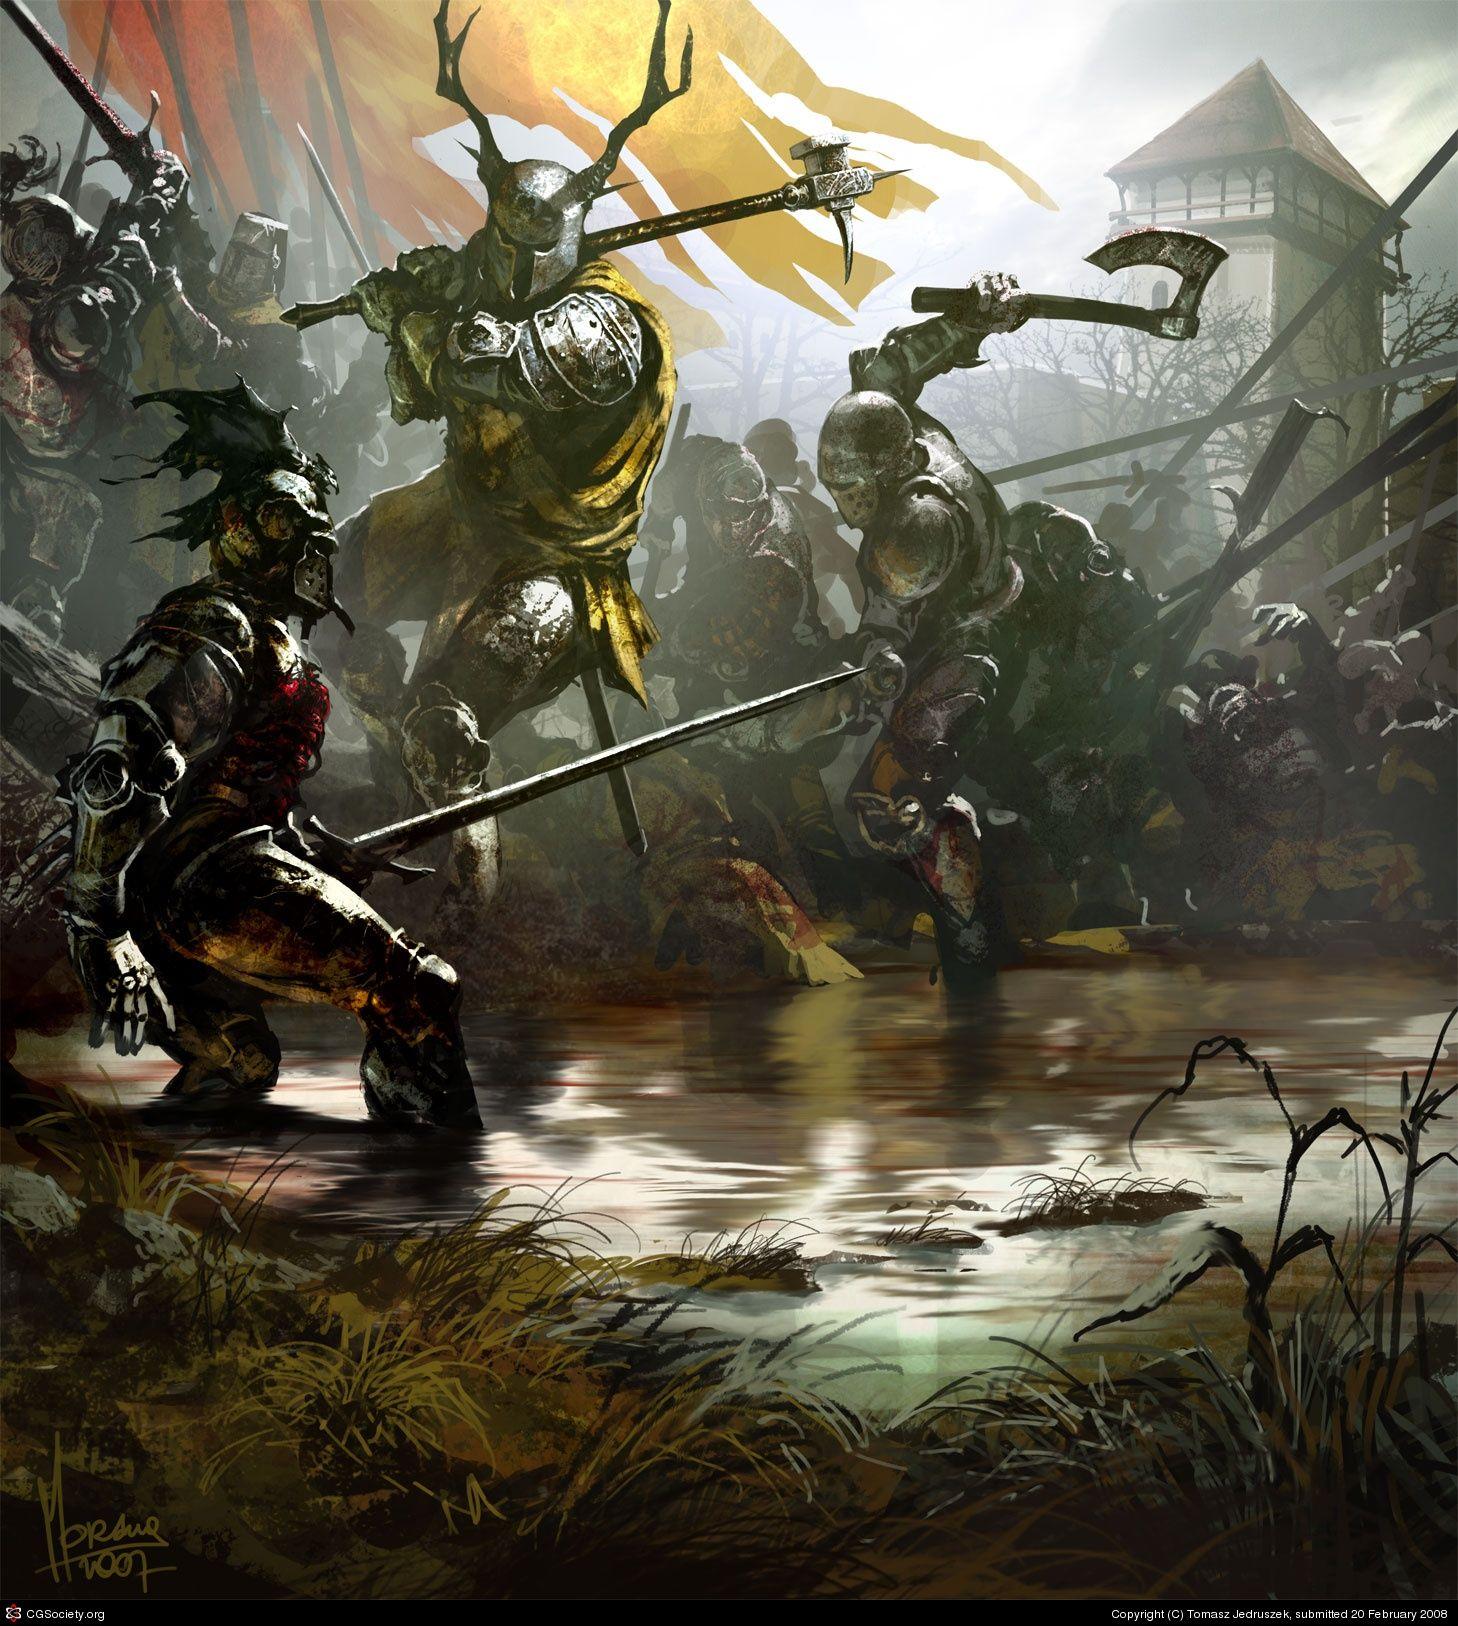 Warriors Fire And Ice Episode 4: Rhaegar Targaryen & Robert Baratheon